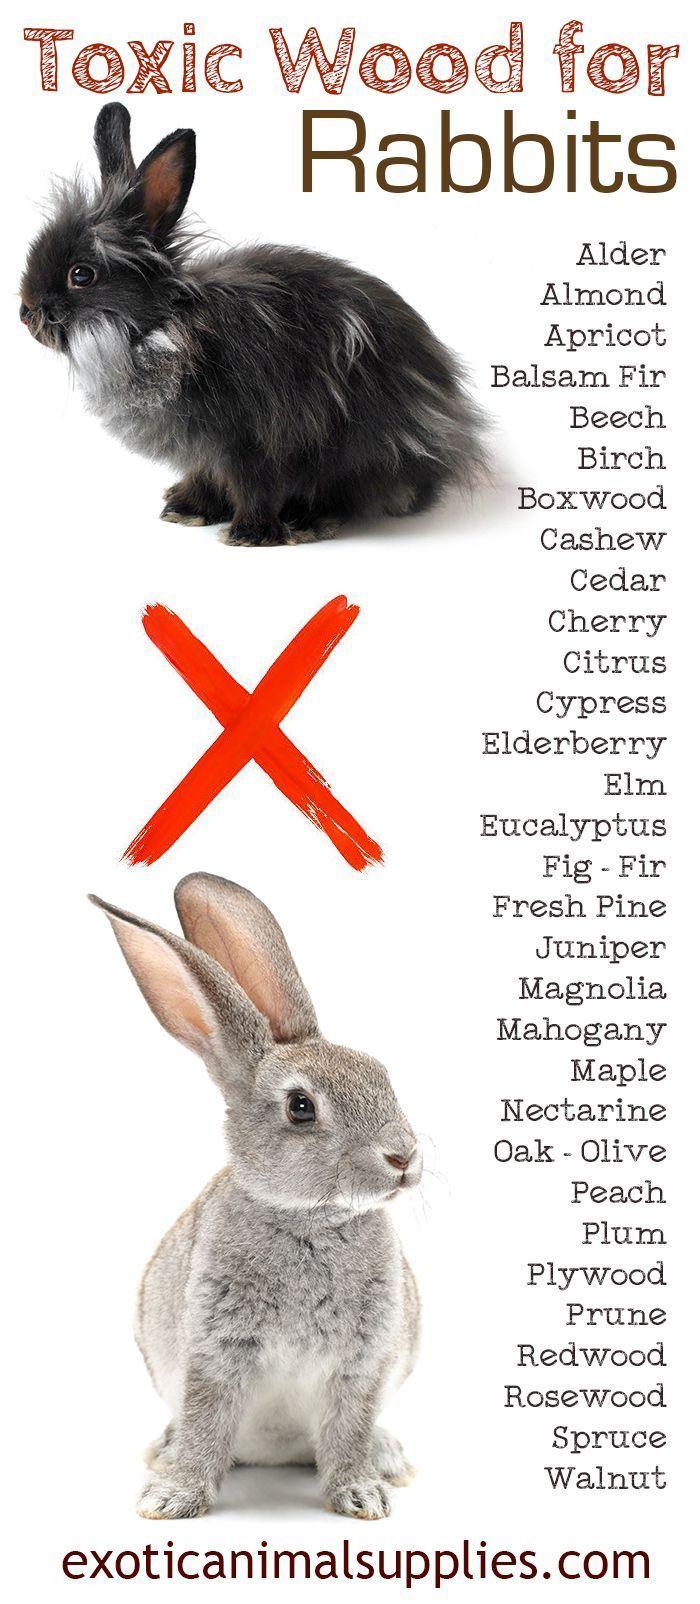 54 Best Rabbit Care Images On Pinterest Bunny Bunny Pet